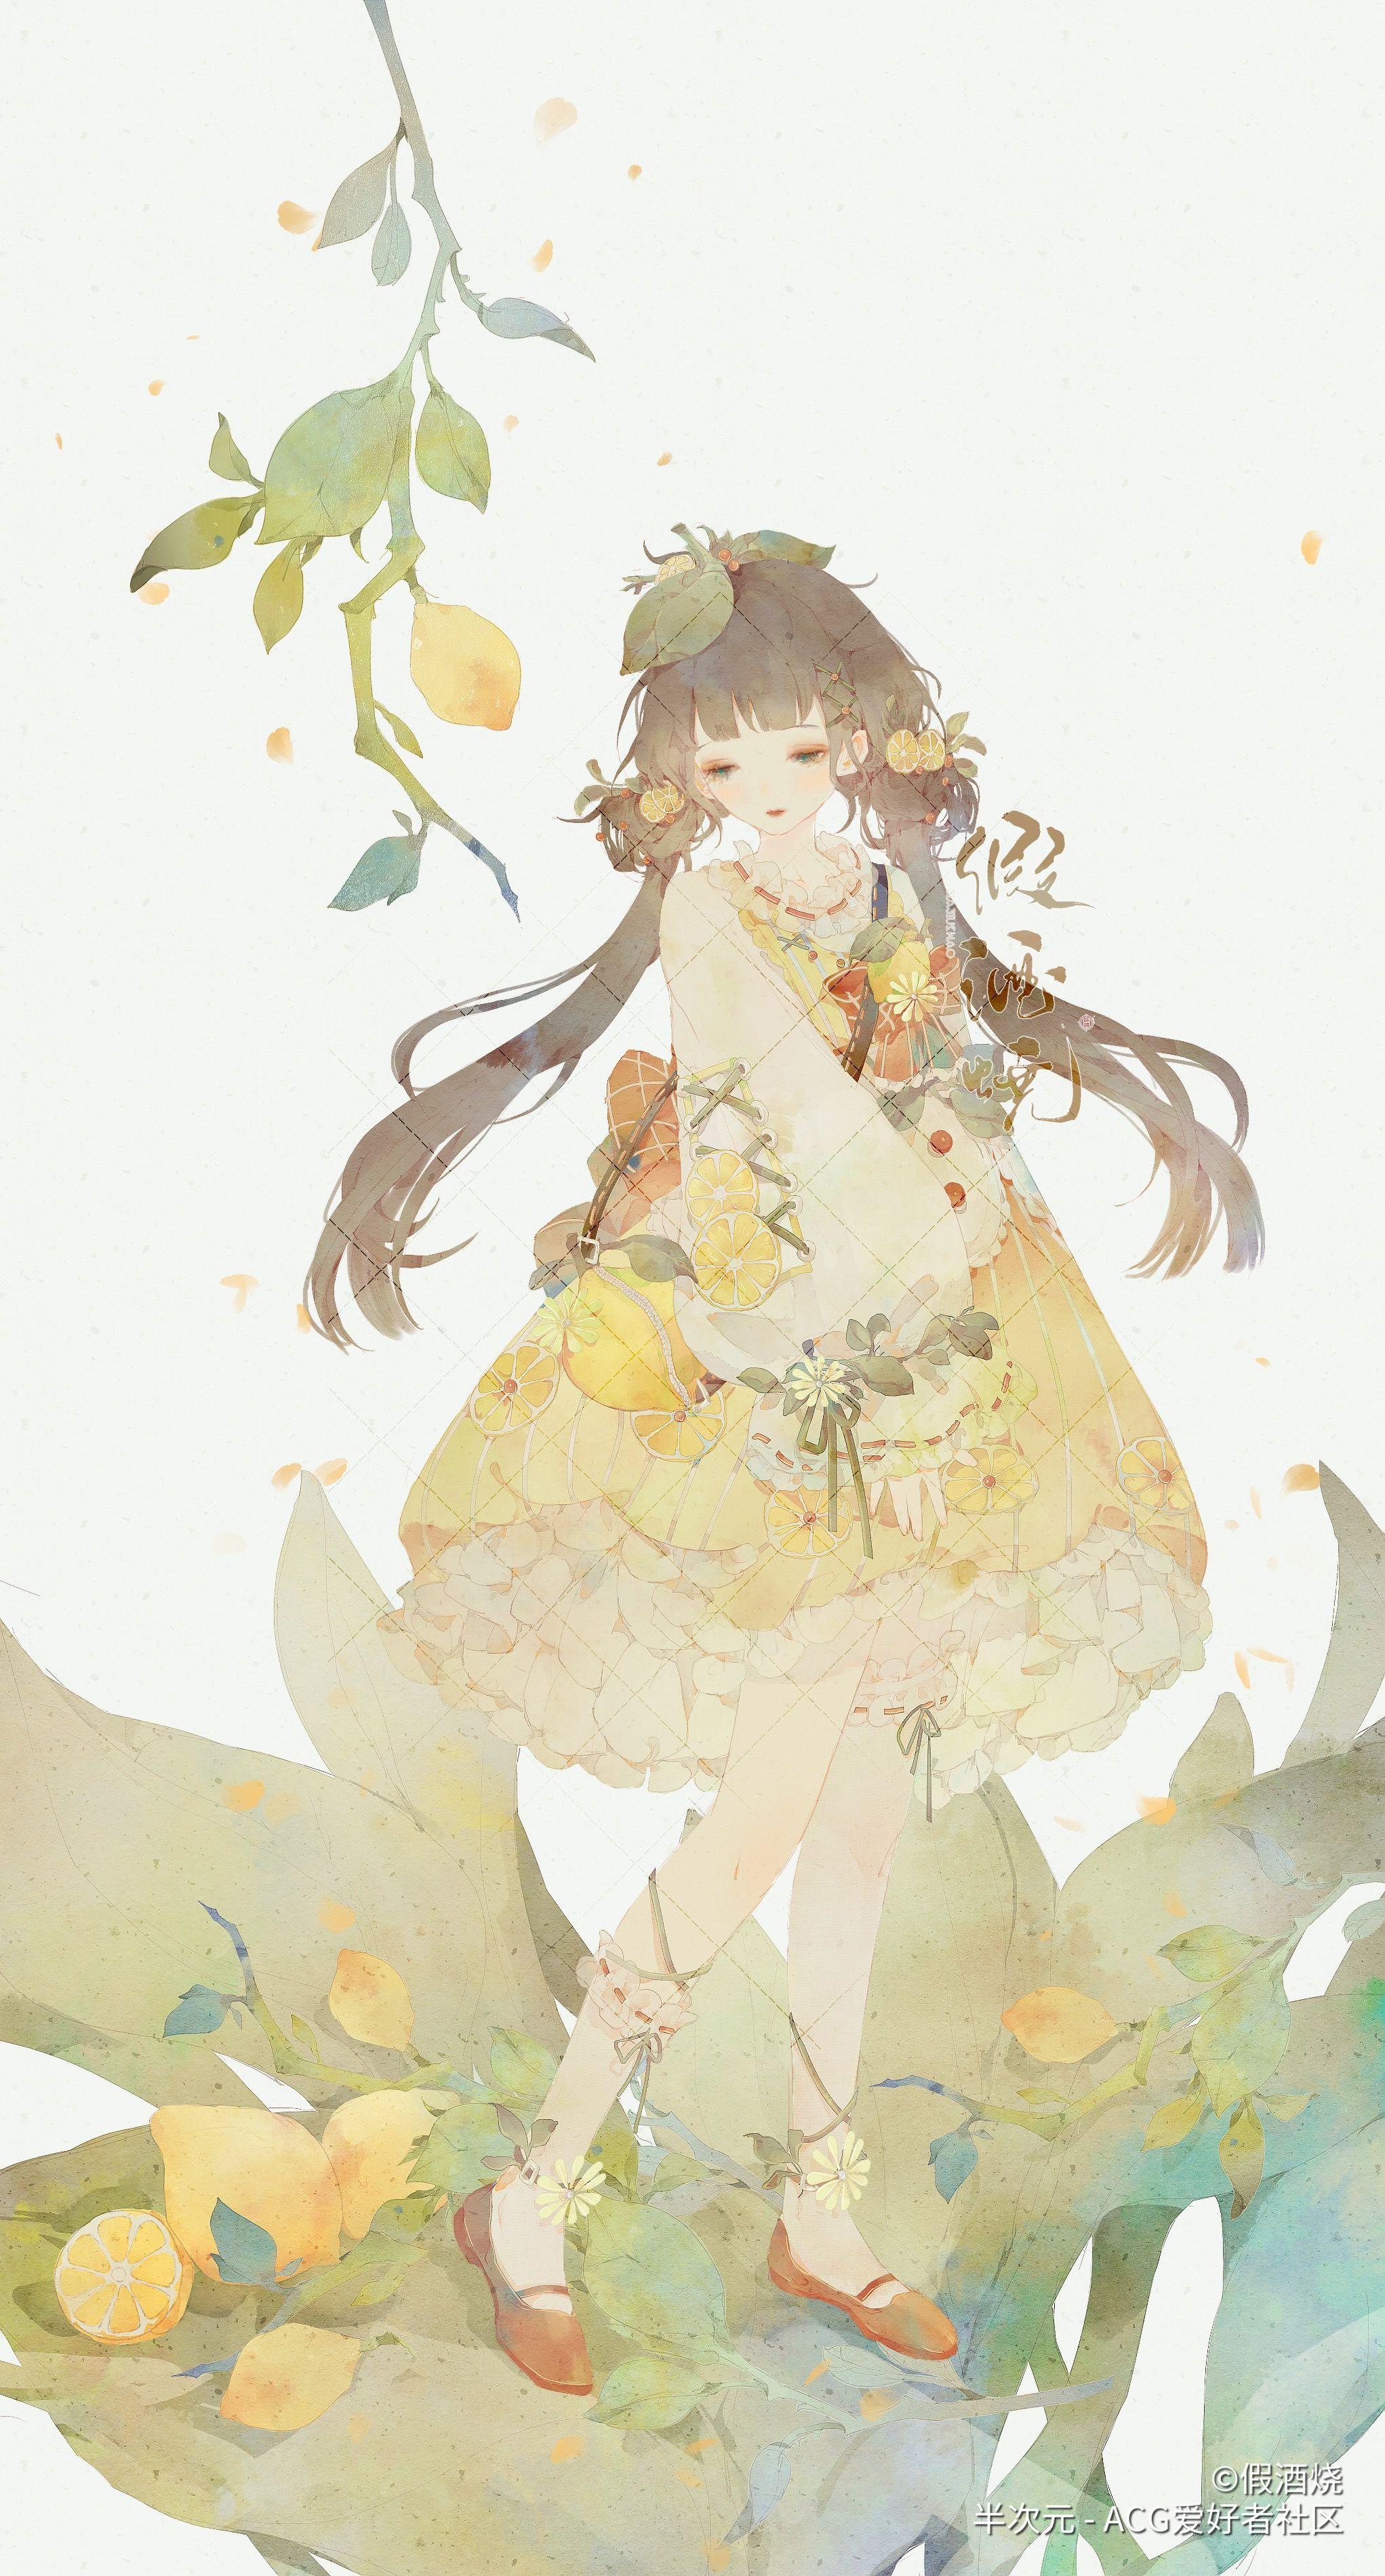 Ghim của 风雨幽雅 trên Manhua*Donghua*Game Minh họa manga